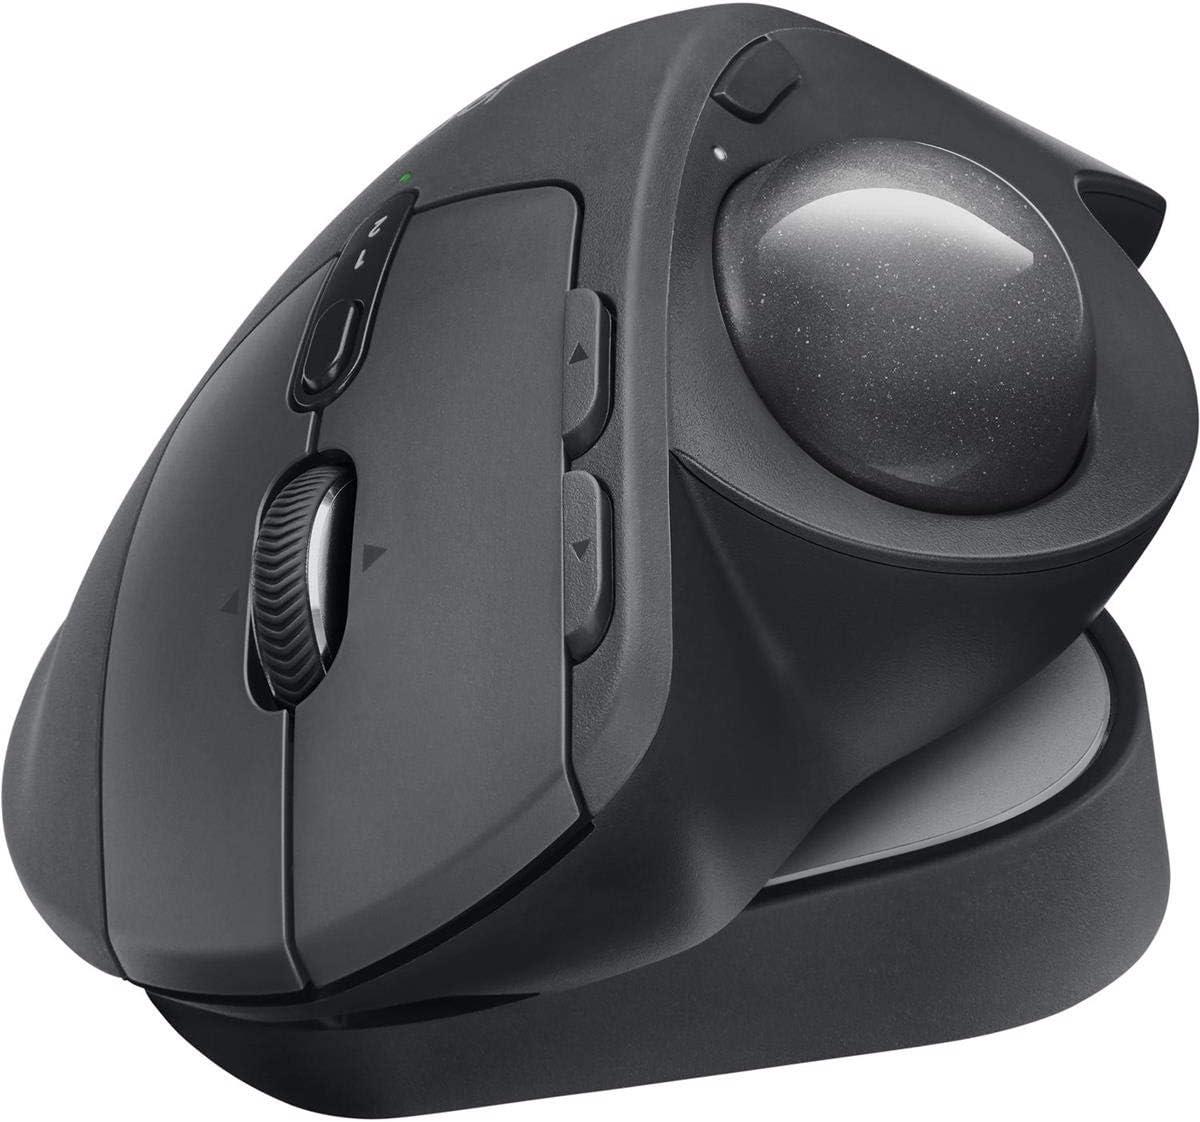 Logitech MX ERGO Wireless Trackball